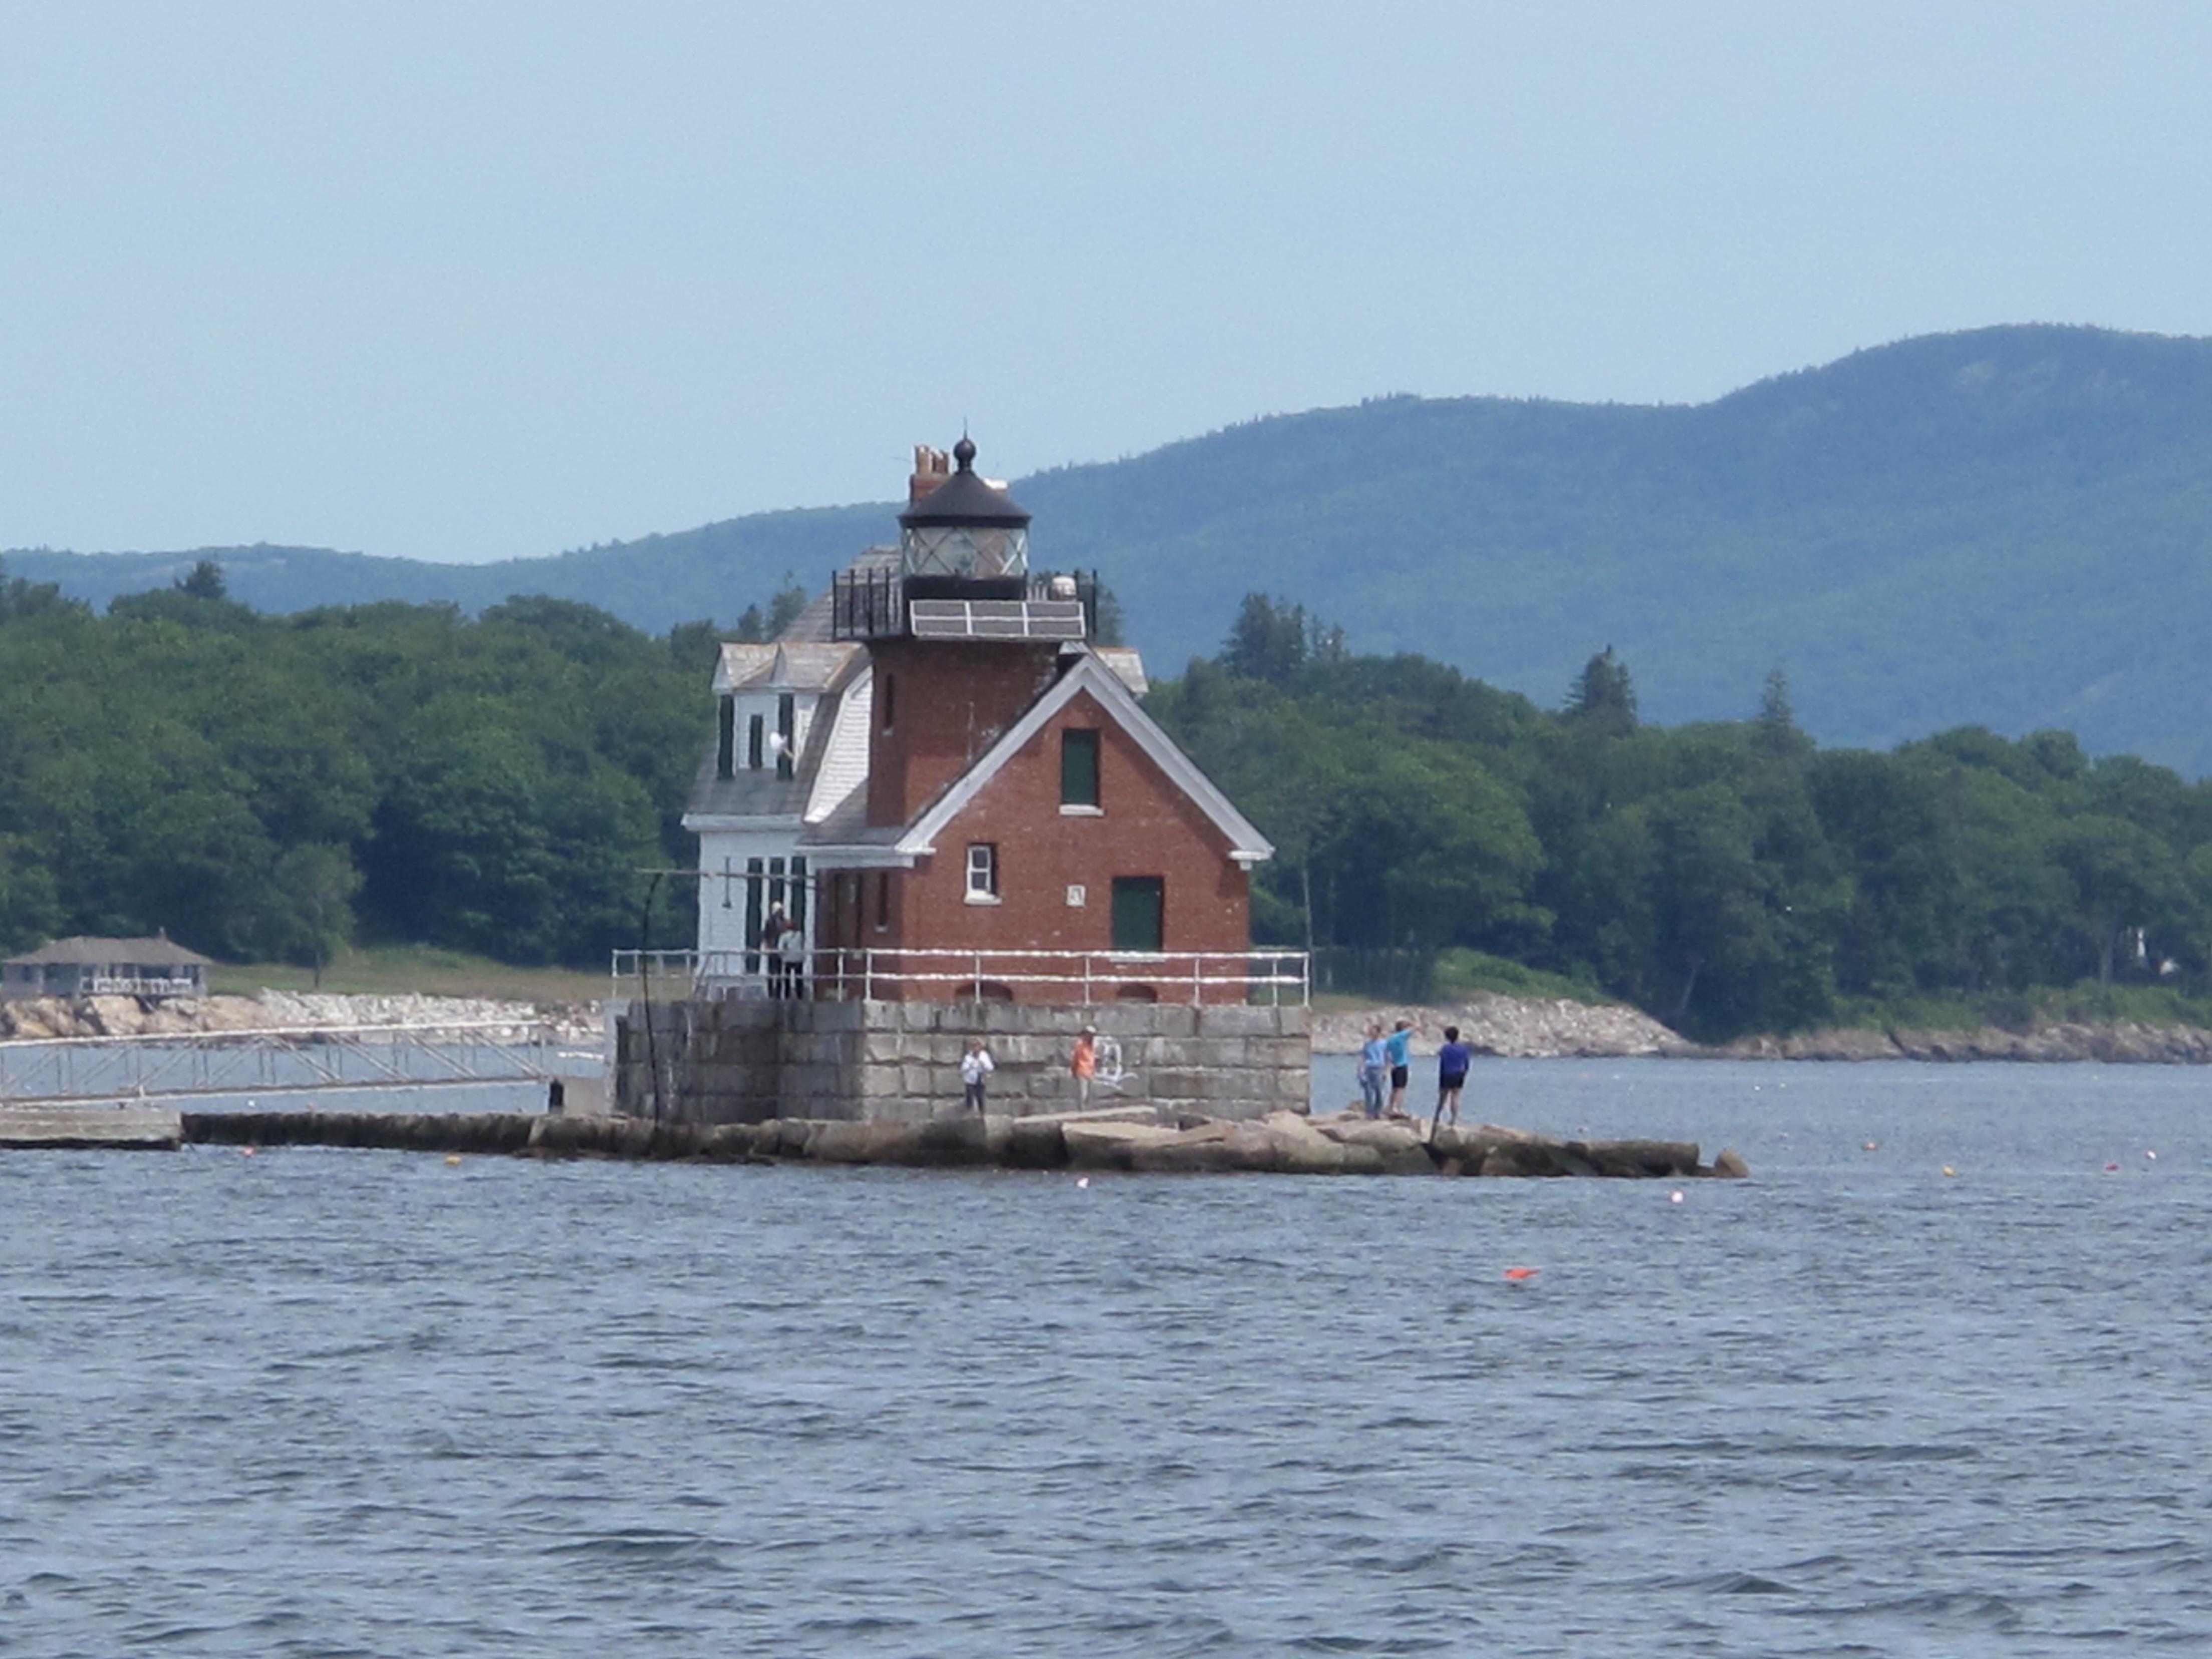 Lighthhouse